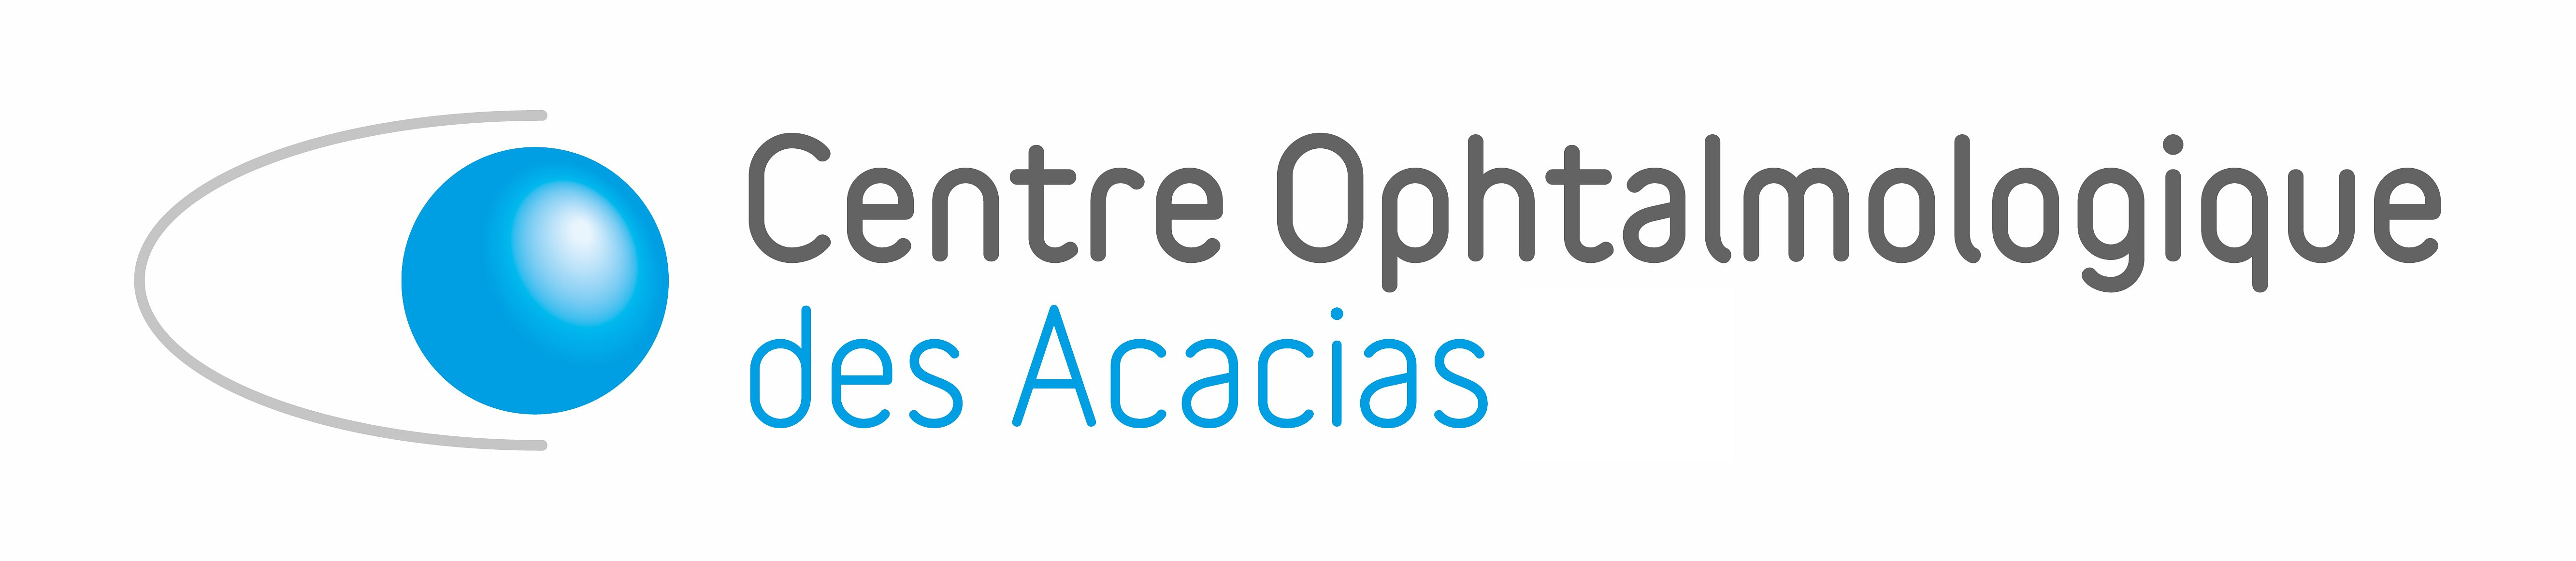 Centre Ophtalmologique des Acacias